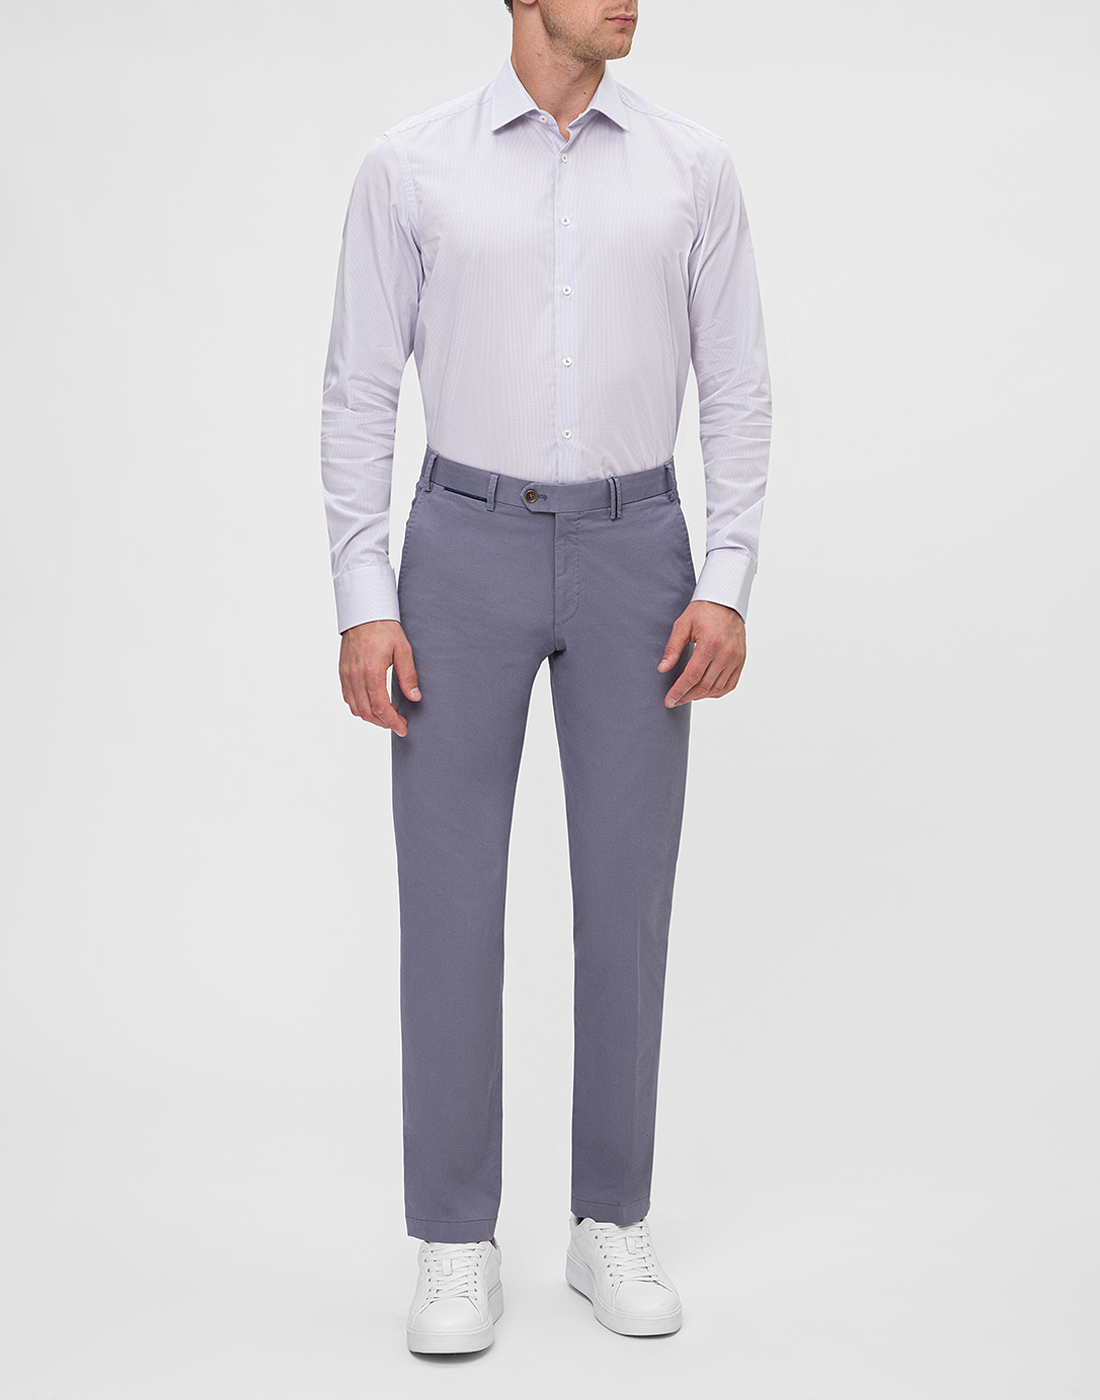 Мужская сиреневая рубашка Van Laack S163209/020-5